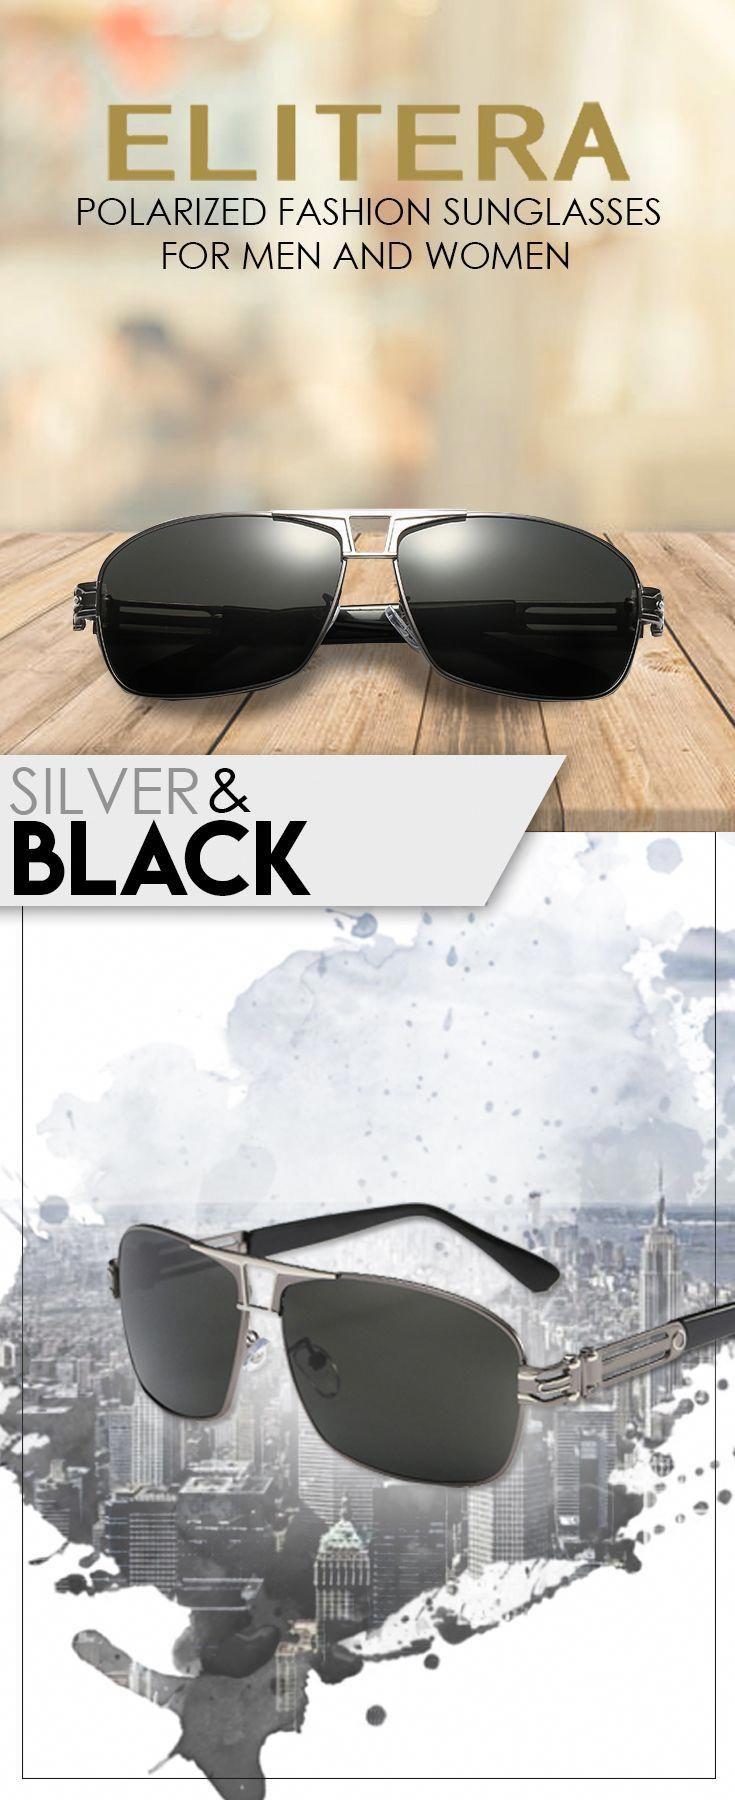 667aa05aeb Men s polarized sport sunglasses - Elitera designer outdoor sunglasses -  Men s and women s top brand fashion affordable accessories  sunglasses ...